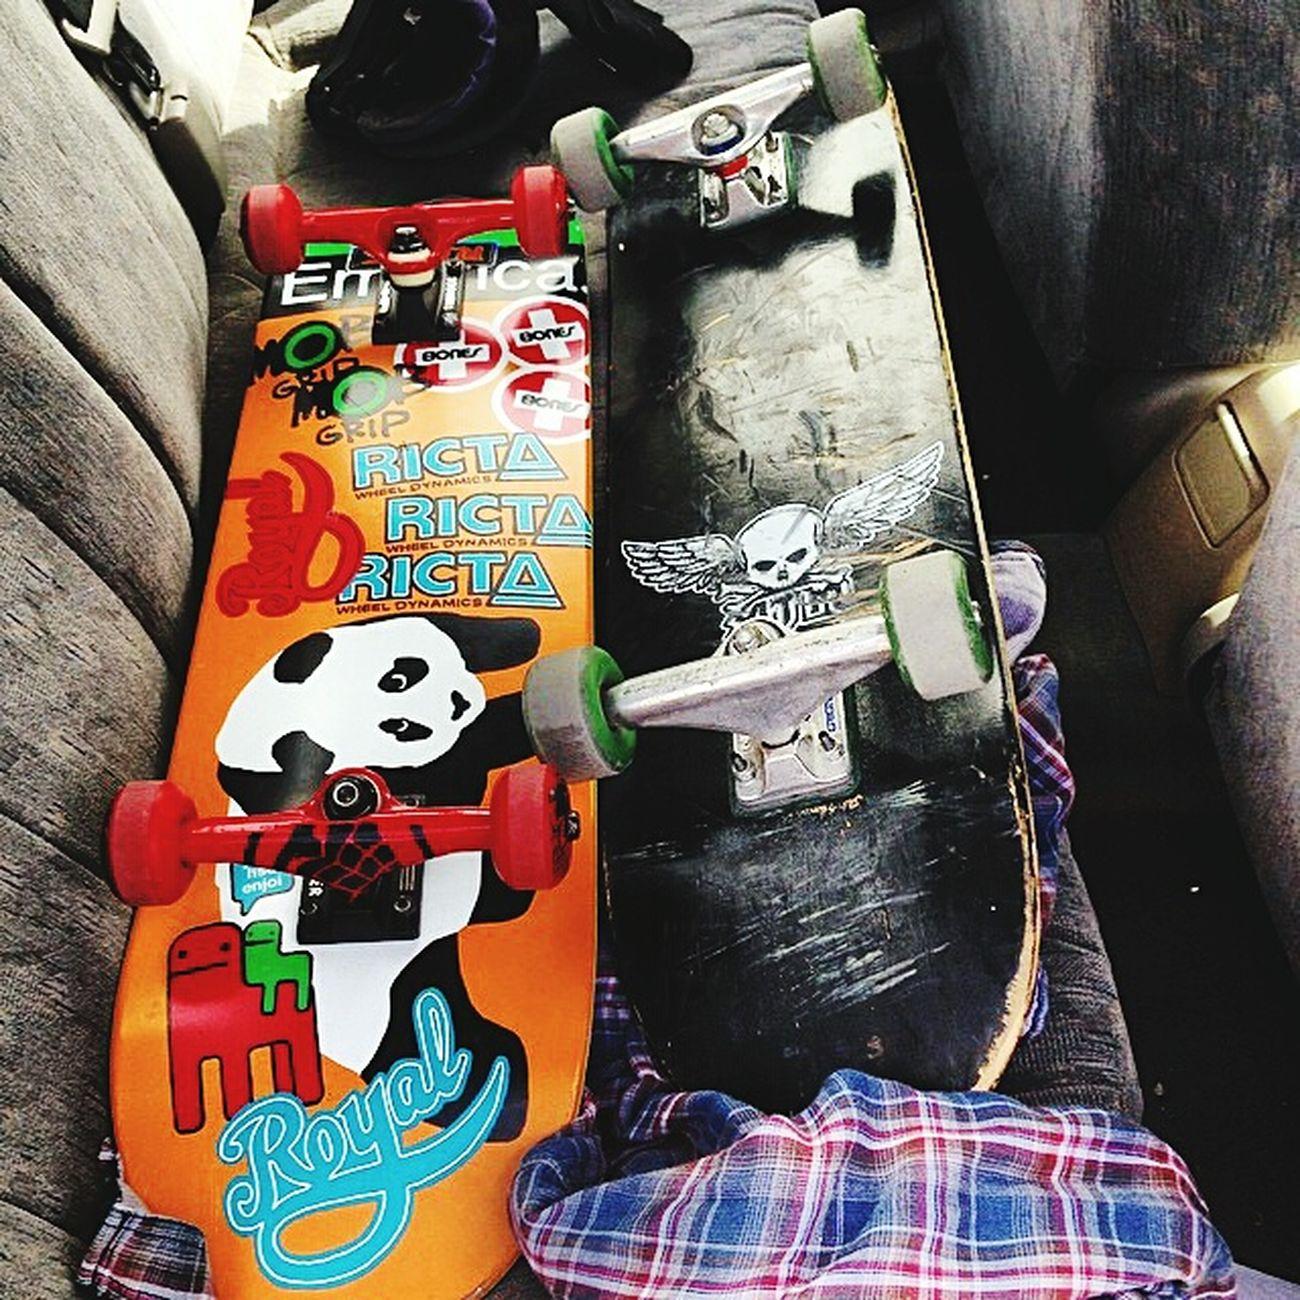 Skateboard SkateboardLifeStyle Skateboards Skateboardingforlife Skateboarding Life Skate Or Die Skateallday Skatelife Skate Skateboarding